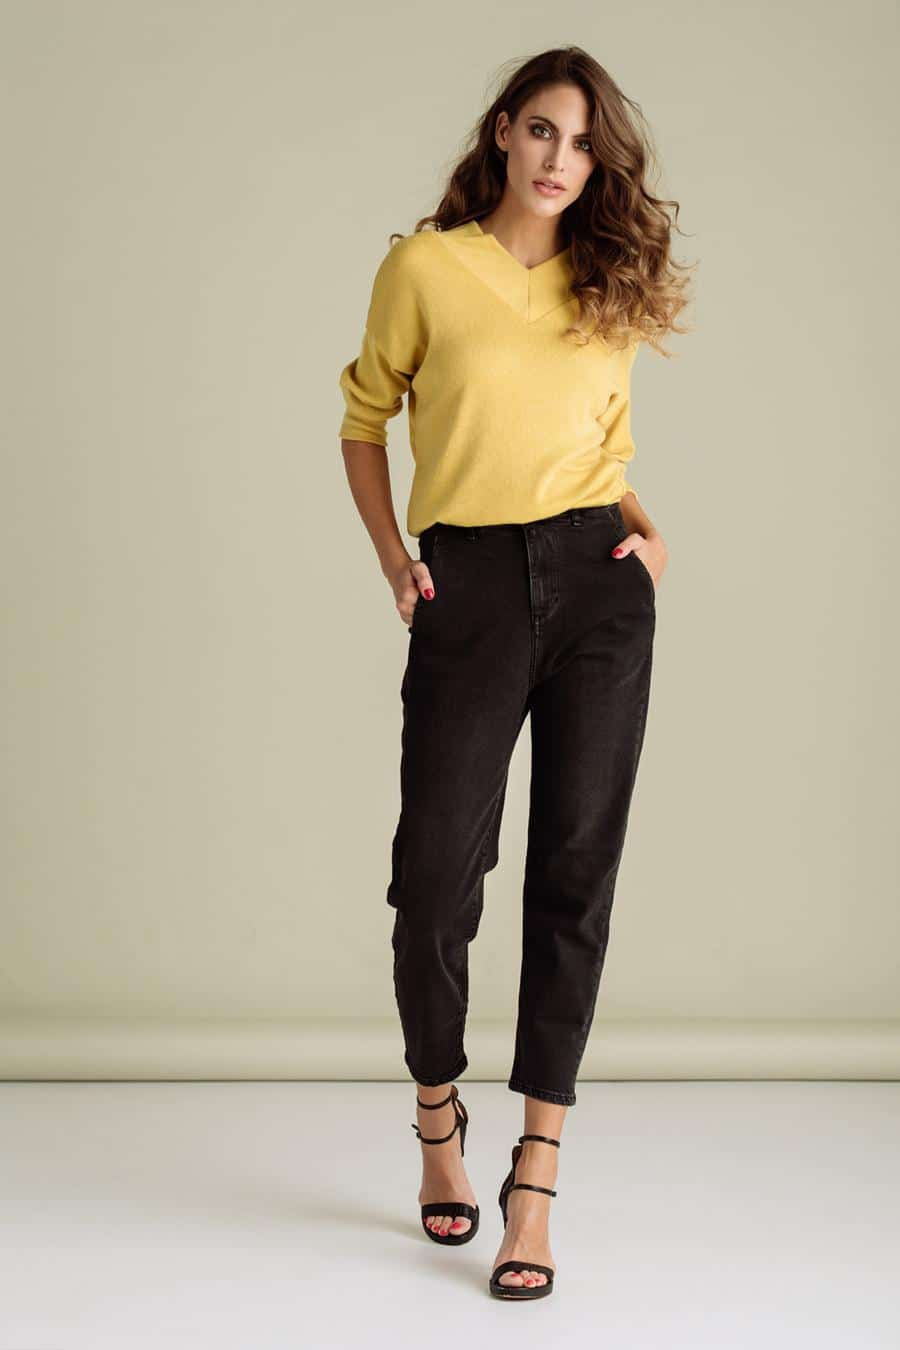 Jagger Zenska Bluza Kolekcija Prolece Leto Ss2021 Kupi Online Jg 9267 08 4 New